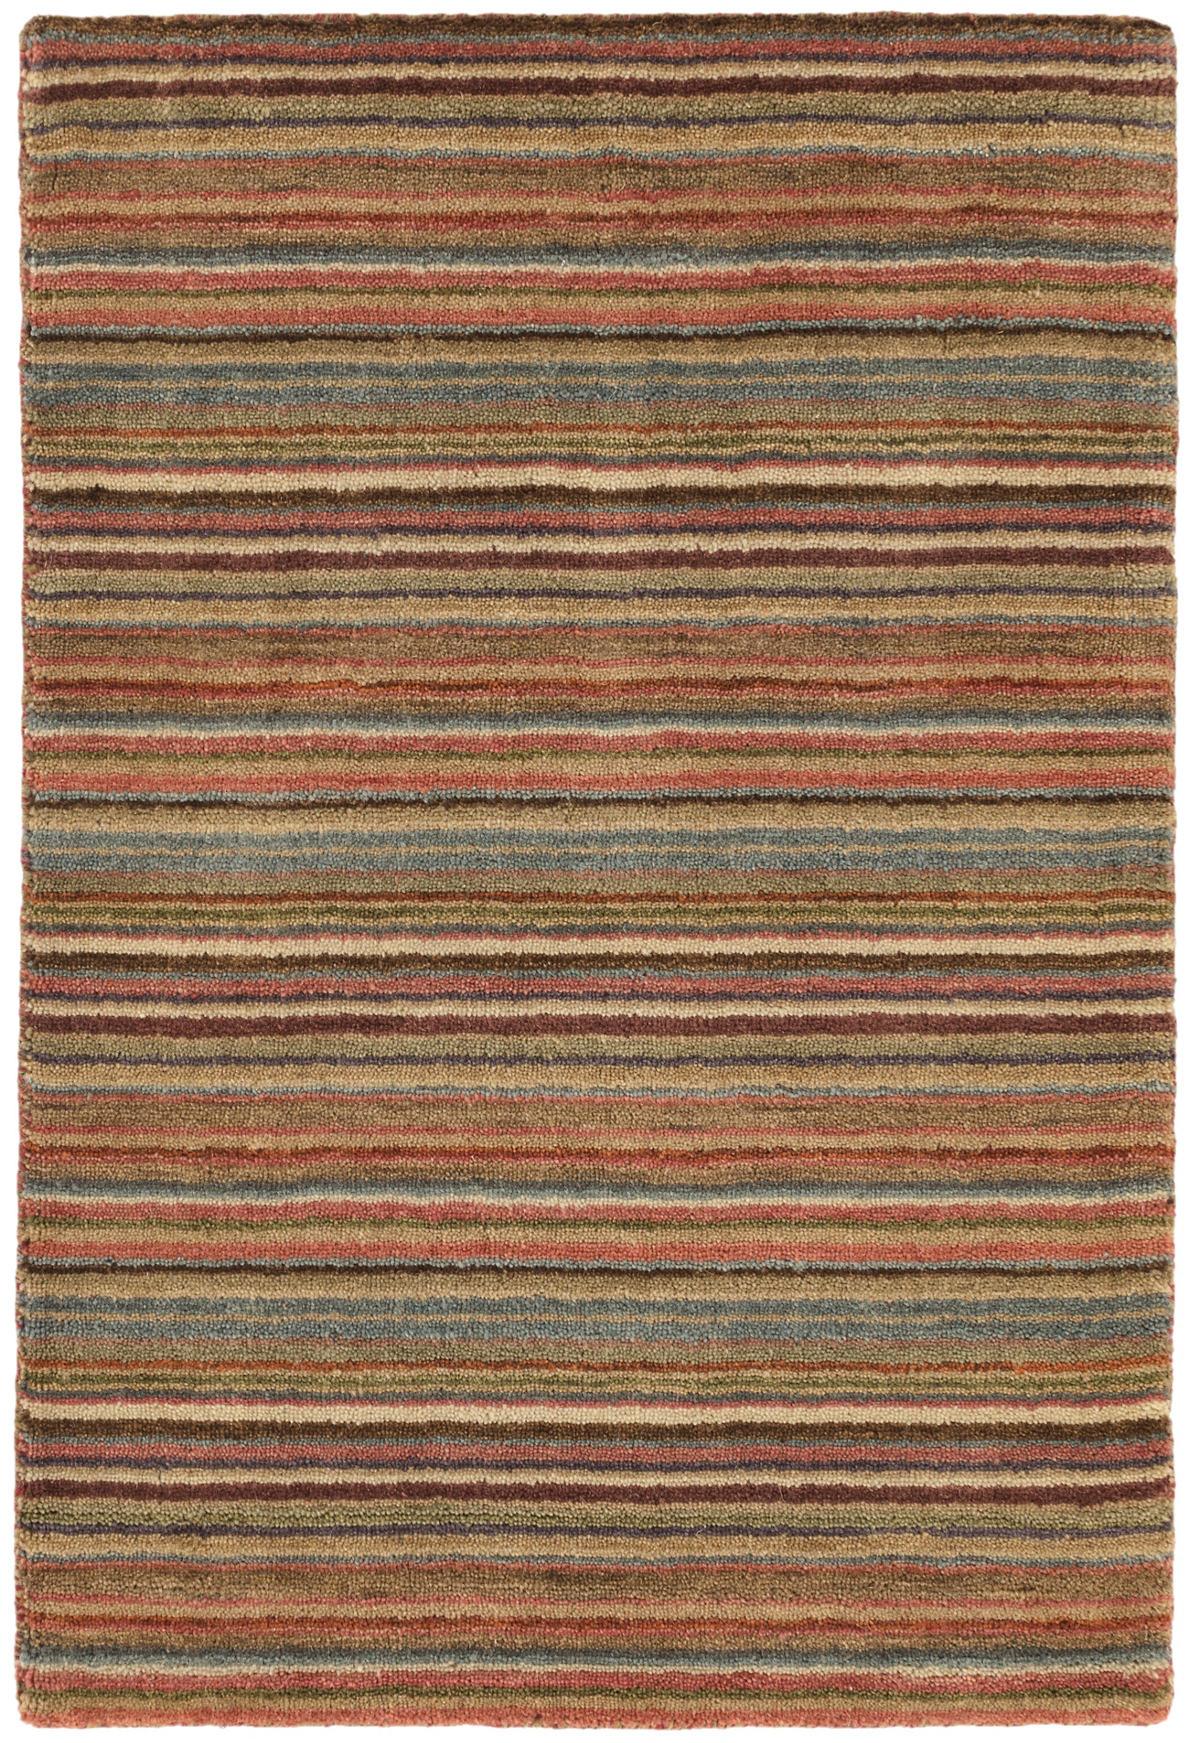 Brindle Stripe Spice Loom Knotted Rug